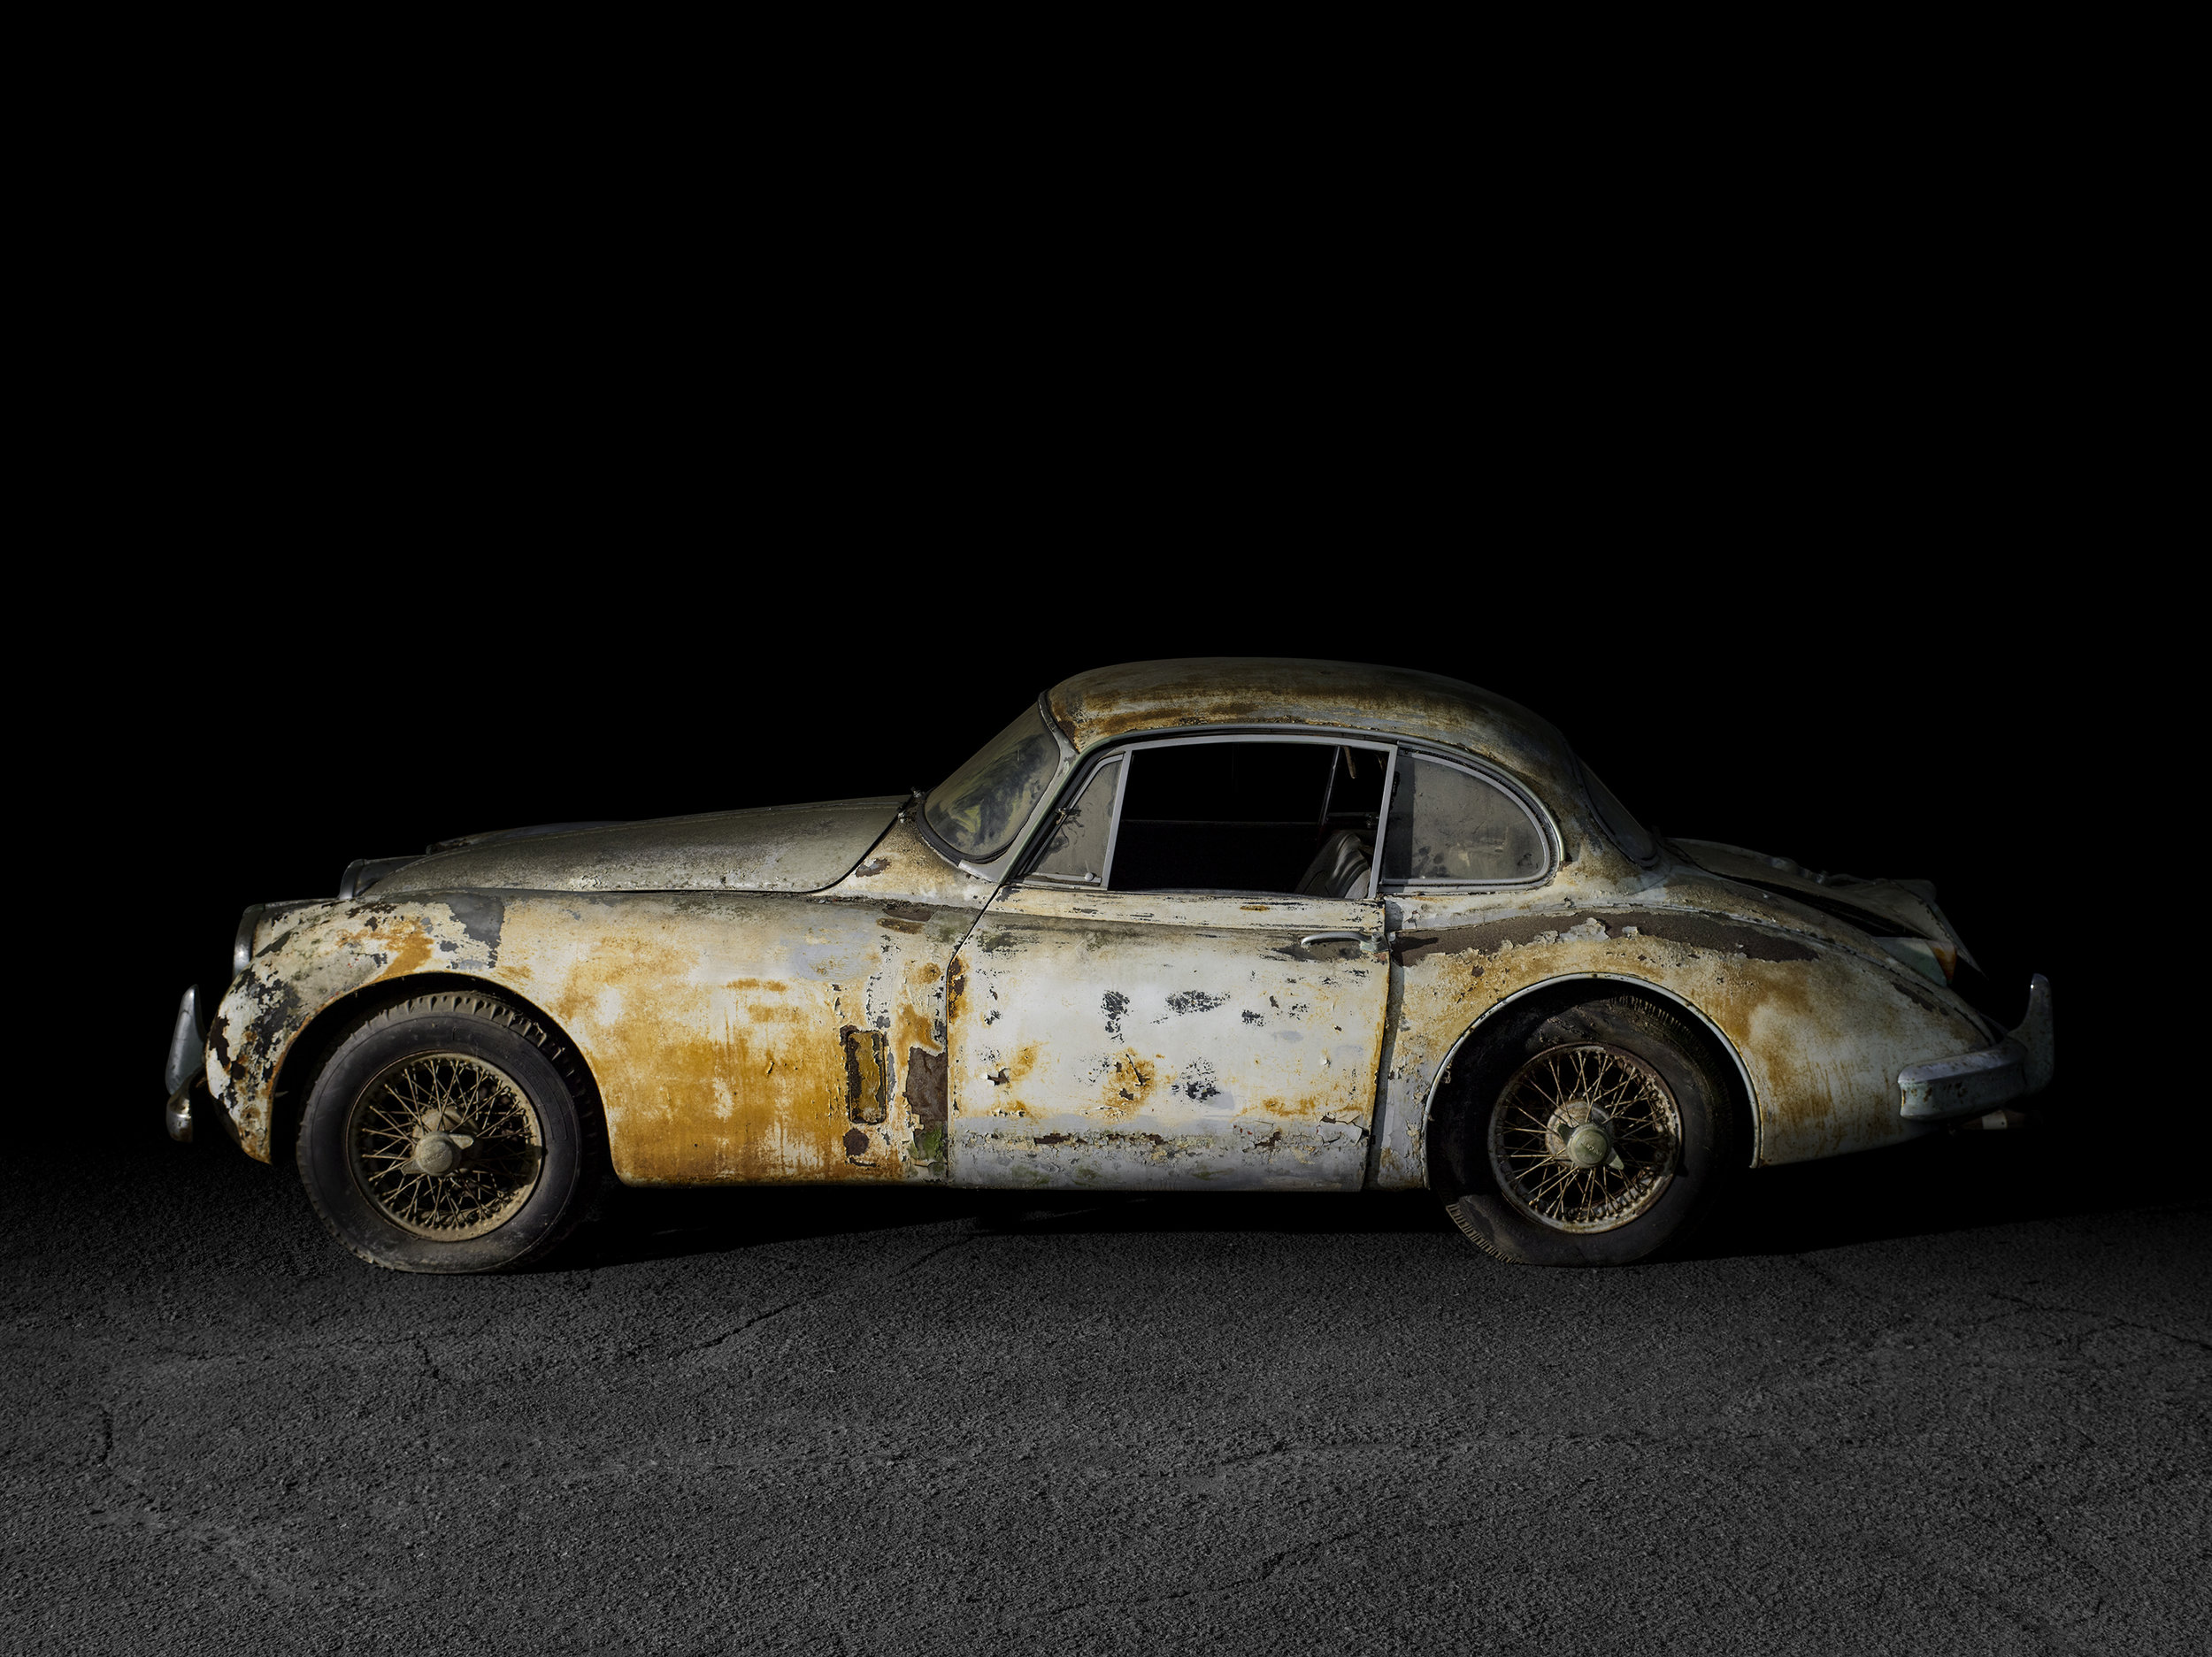 1957 Jaguar XK150 FHC - Barn Find - SOLD as is